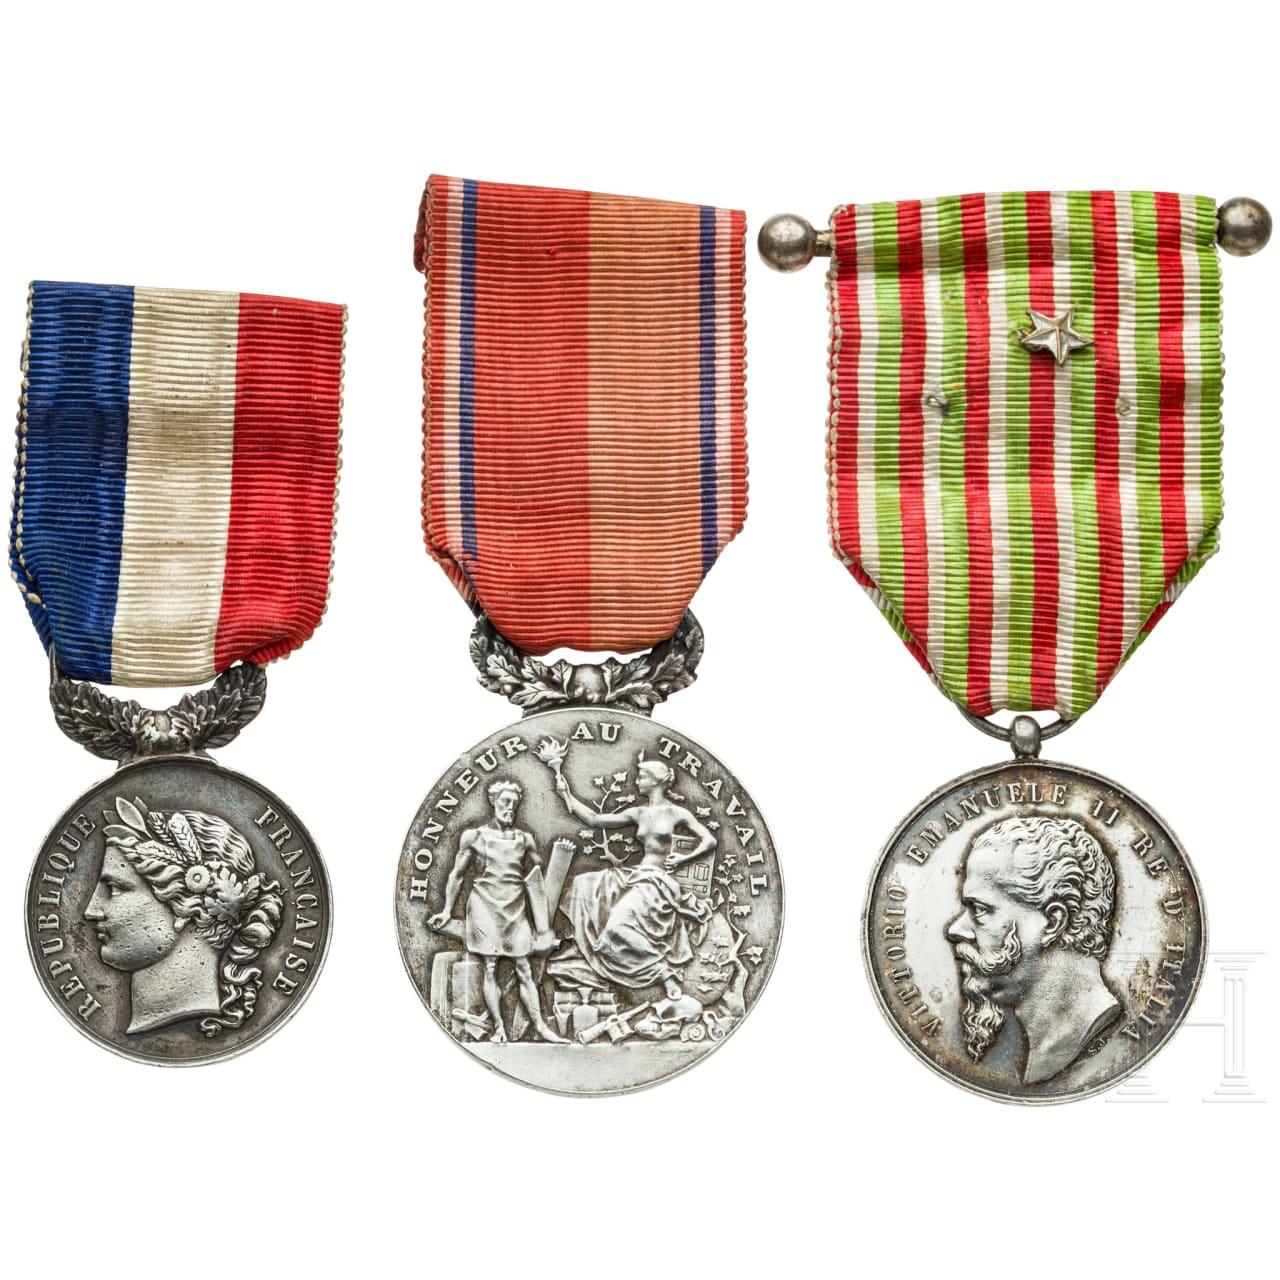 Drei silberne Medaillen, Frankreich/ Italien, 20. Jhdt.